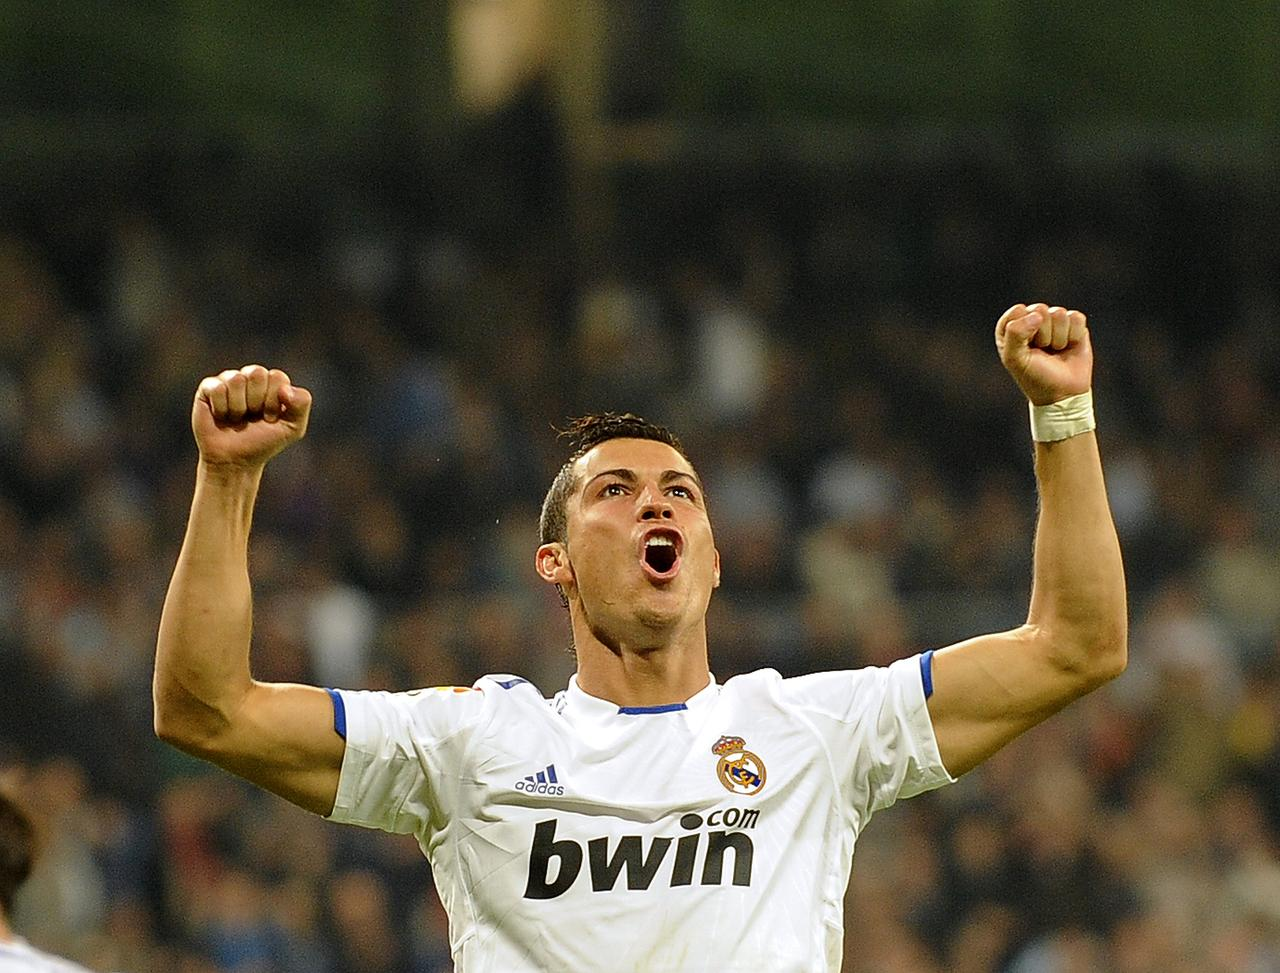 http://1.bp.blogspot.com/-2dhxPT7Svf0/TwxygIjvAkI/AAAAAAAAHy0/r4vtI63yN9M/s1600/Cristiano-Ronaldo-Real-Madrid-Celebration-Goal-Photos.jpg